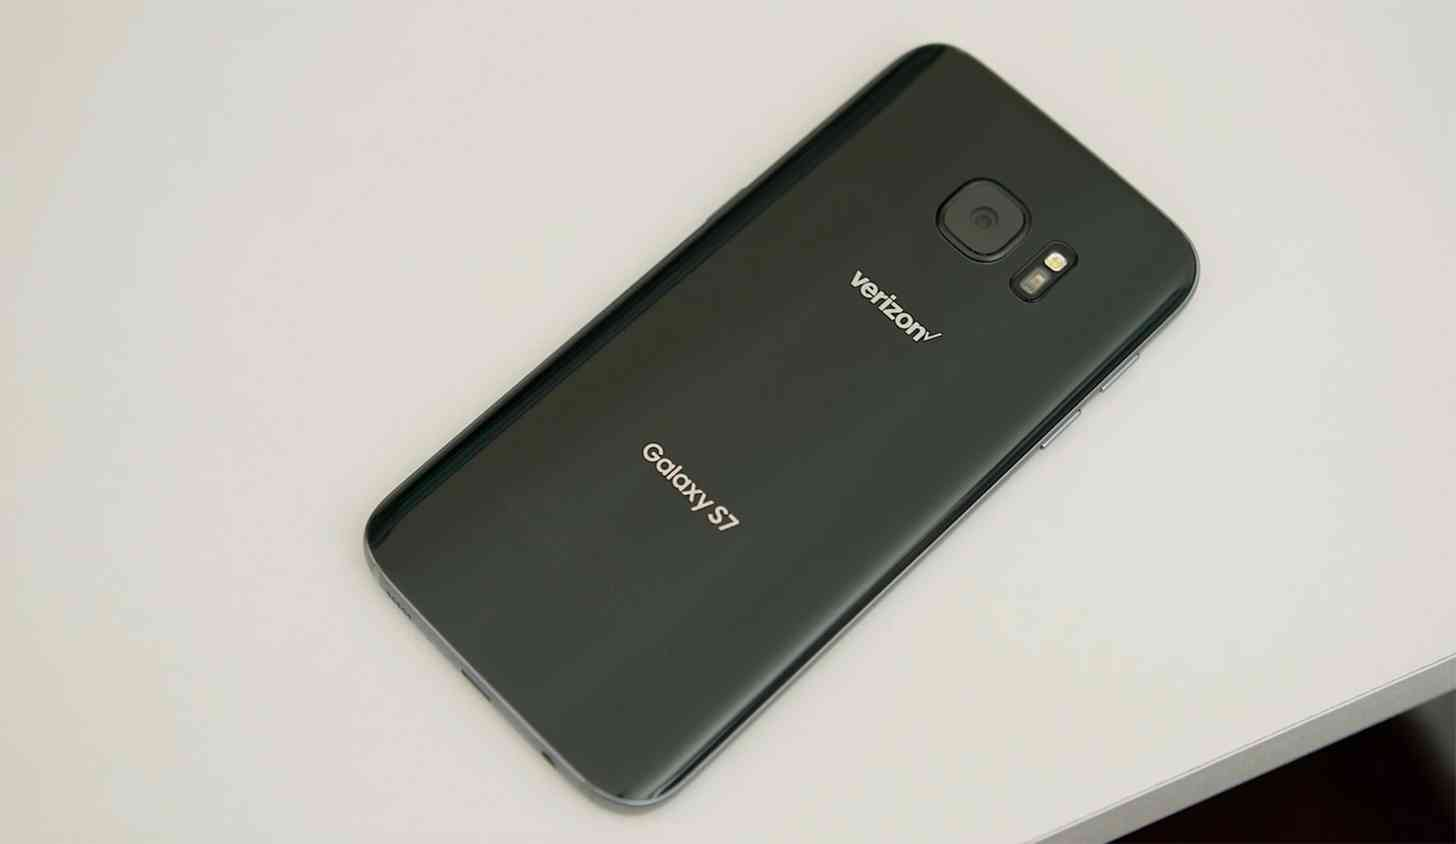 Verizon Samsung Galaxy S7 hands-on review